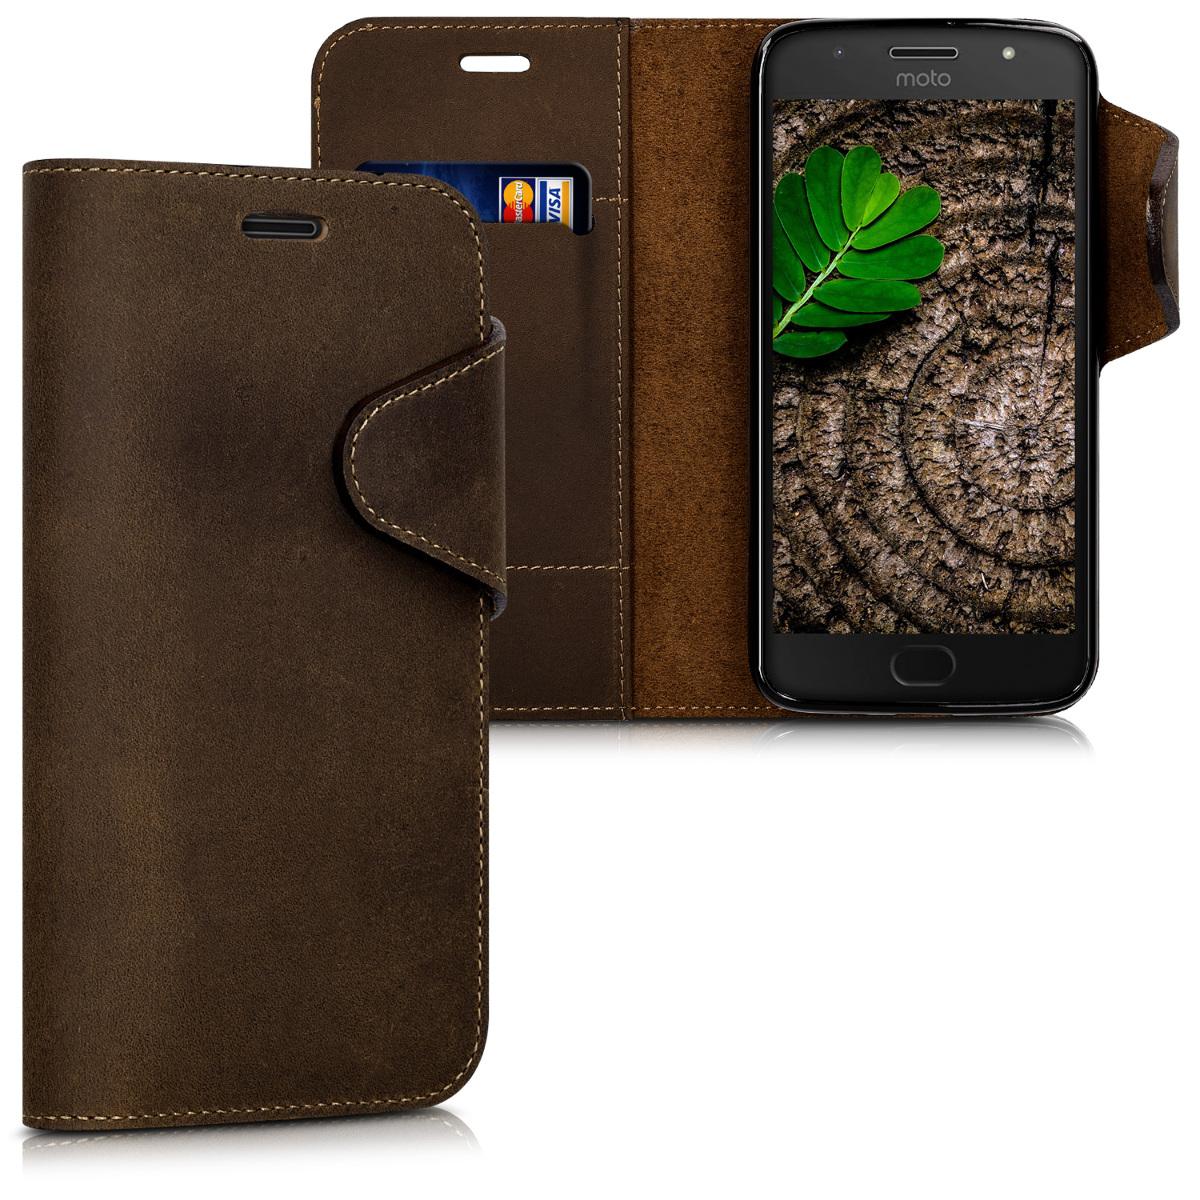 Kalibri Δερμάτινη Suede Θήκη - Πορτοφόλι Motorola Moto G5S - Brown (42817.05)